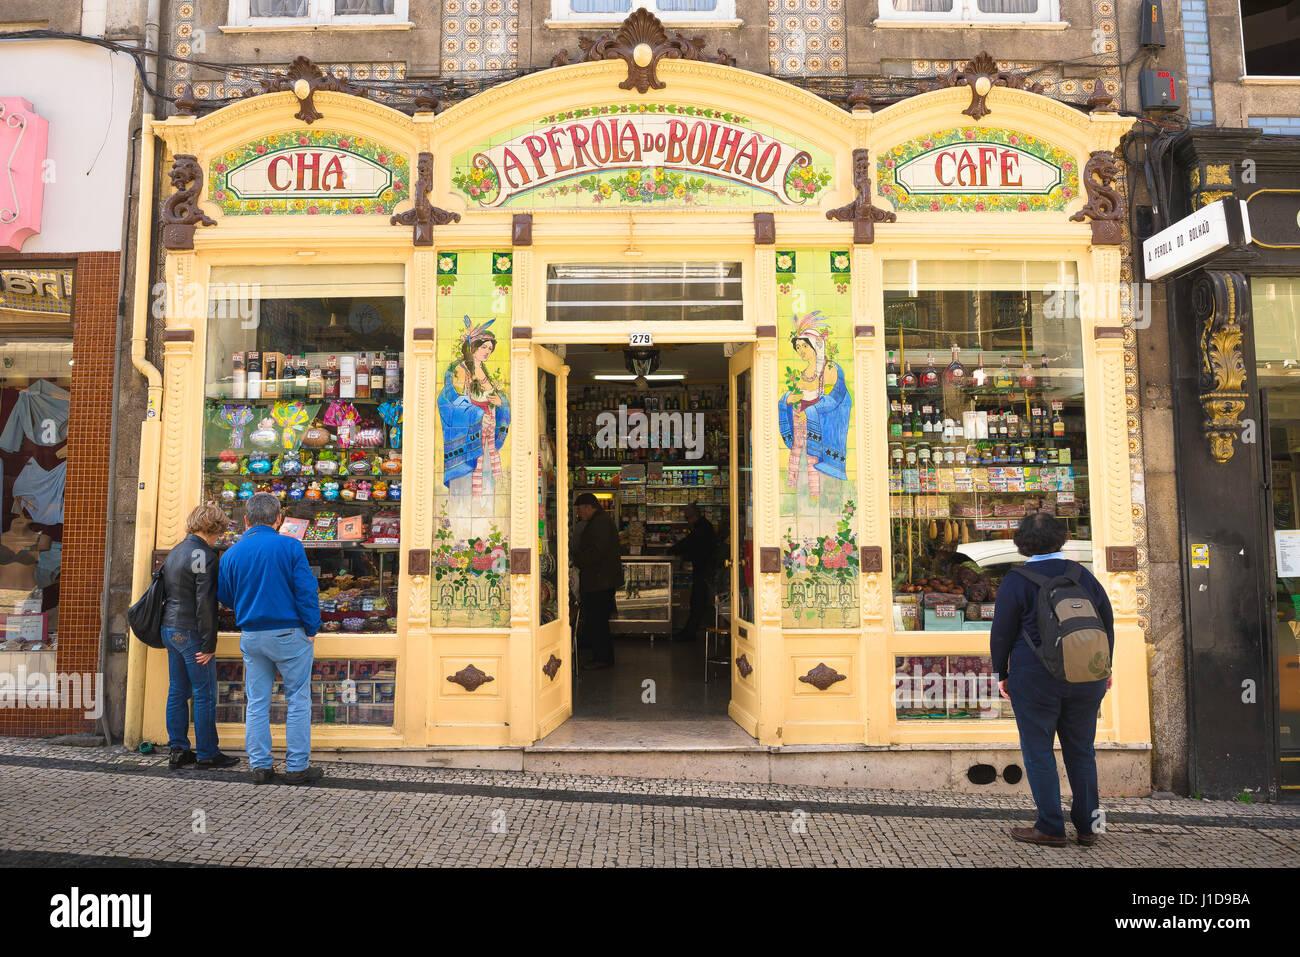 Shop Porto Portugal, colourful art nouveau style exterior of a shop in the Bolhao area of the centre of Porto (Oporto). - Stock Image